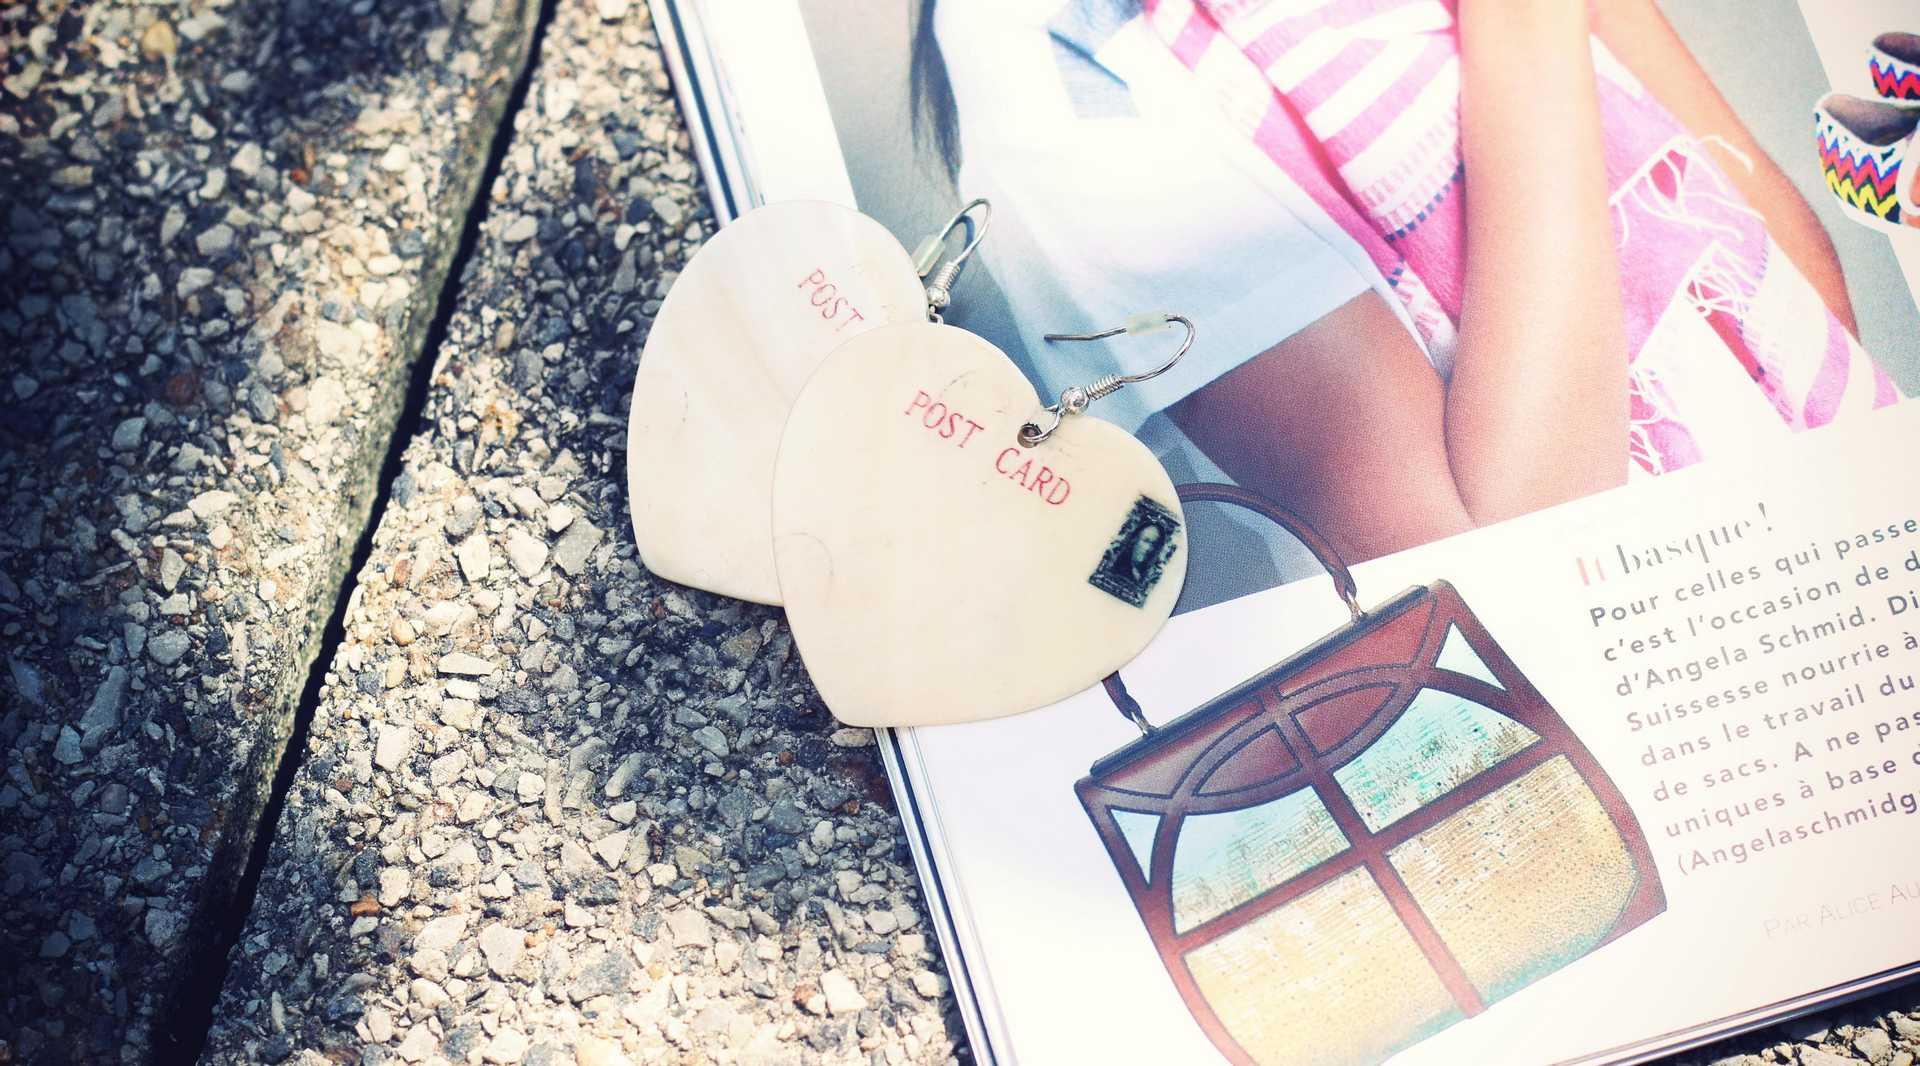 nunaavane-beauty-blogger-july-favorites-summer-makeup-skincare4